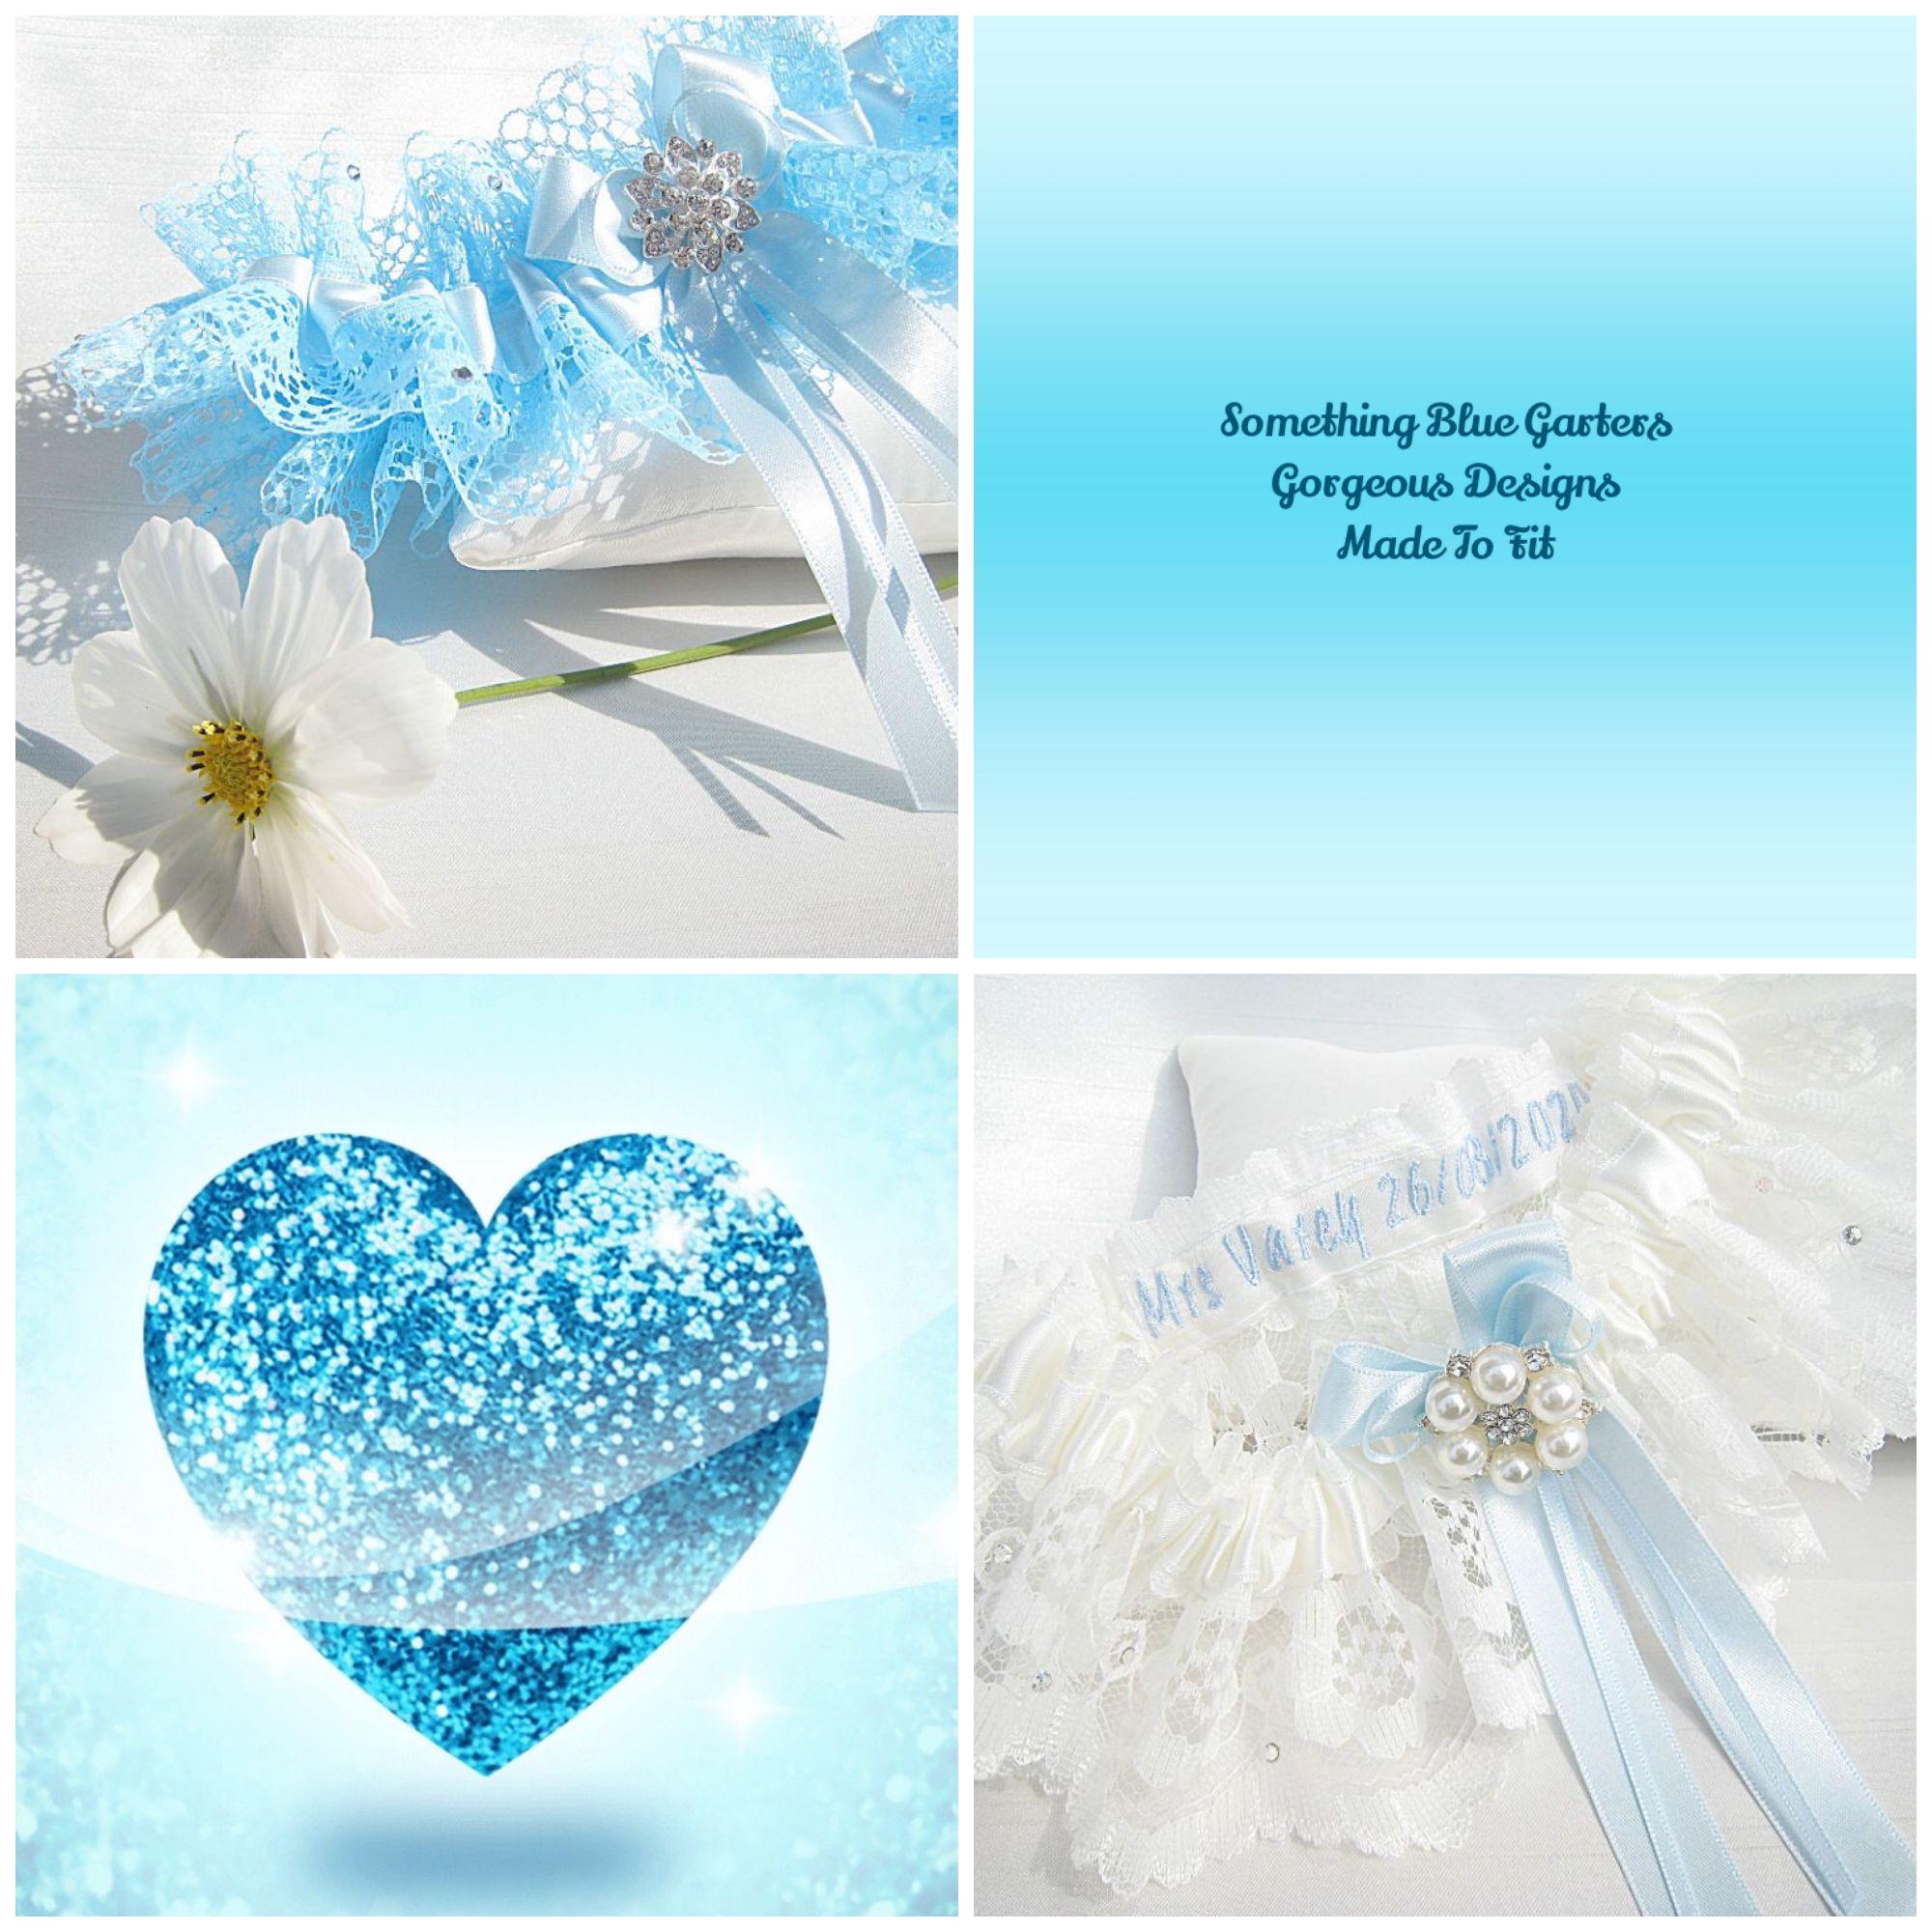 Luxury Wedding Garters, Handmade & Personalised With Blue Thread.